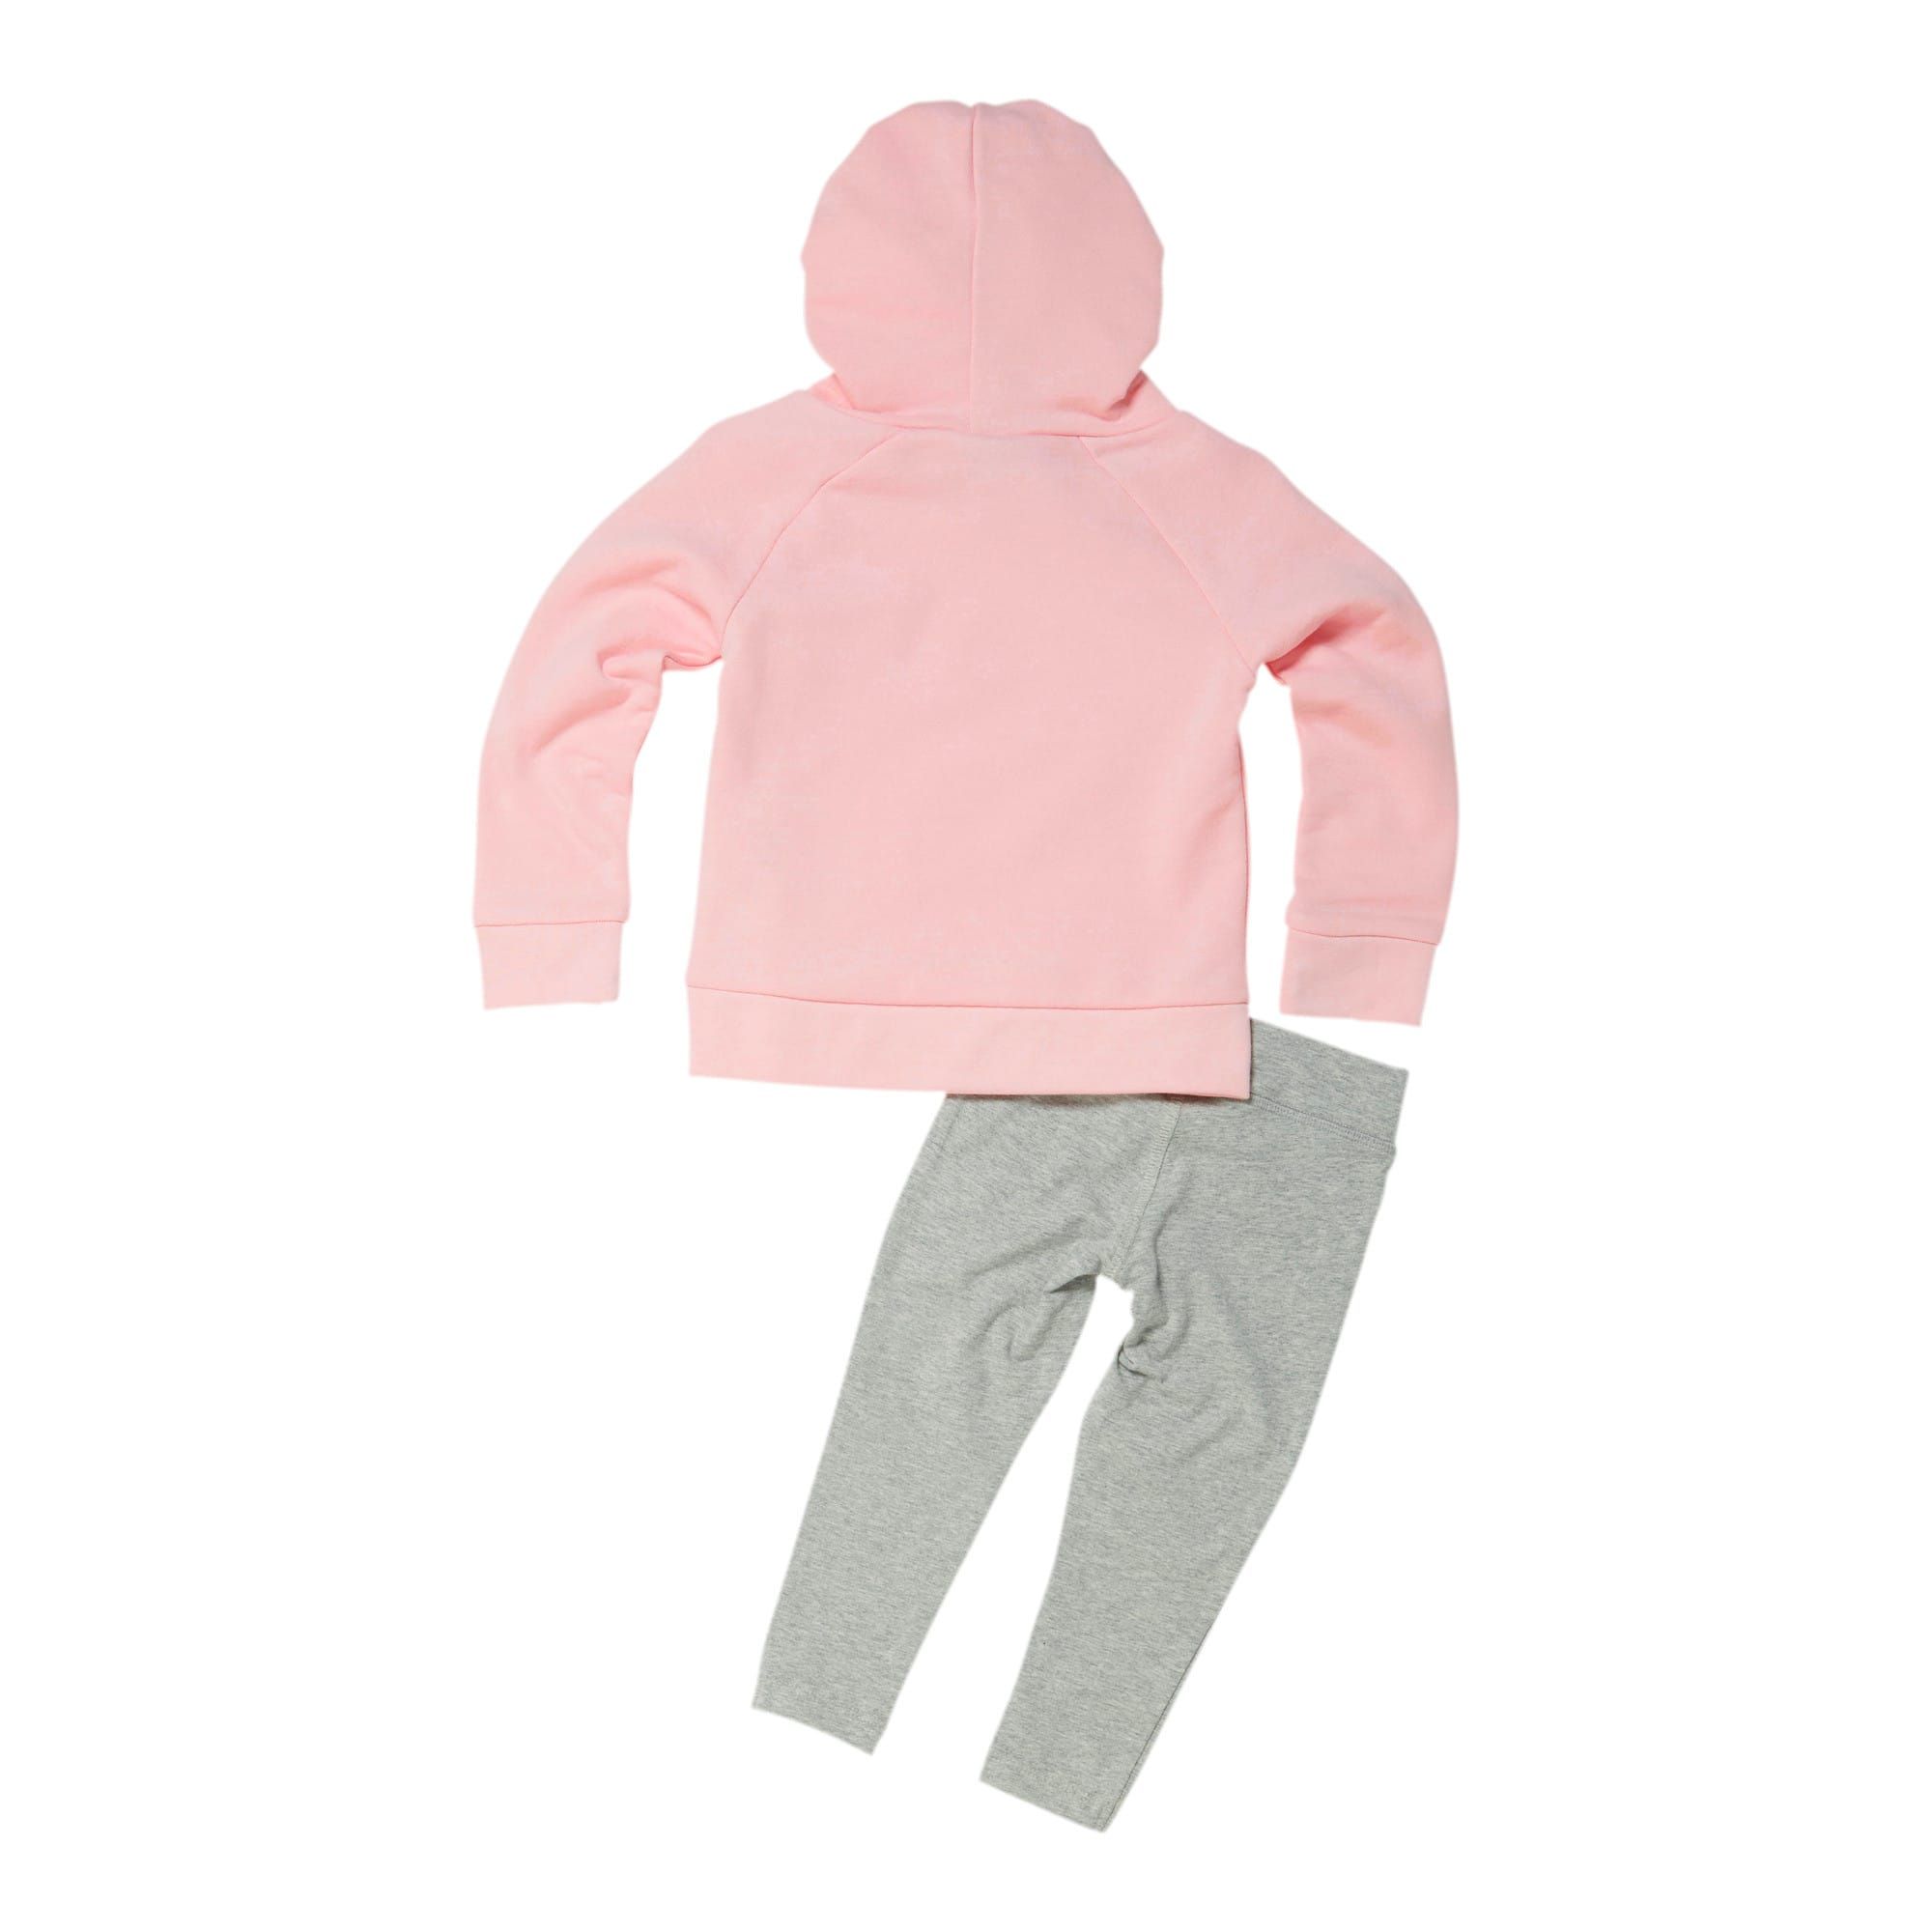 Thumbnail 2 of Toddler Fleece Pullover and Legging Set, CRYSTAL ROSE, medium